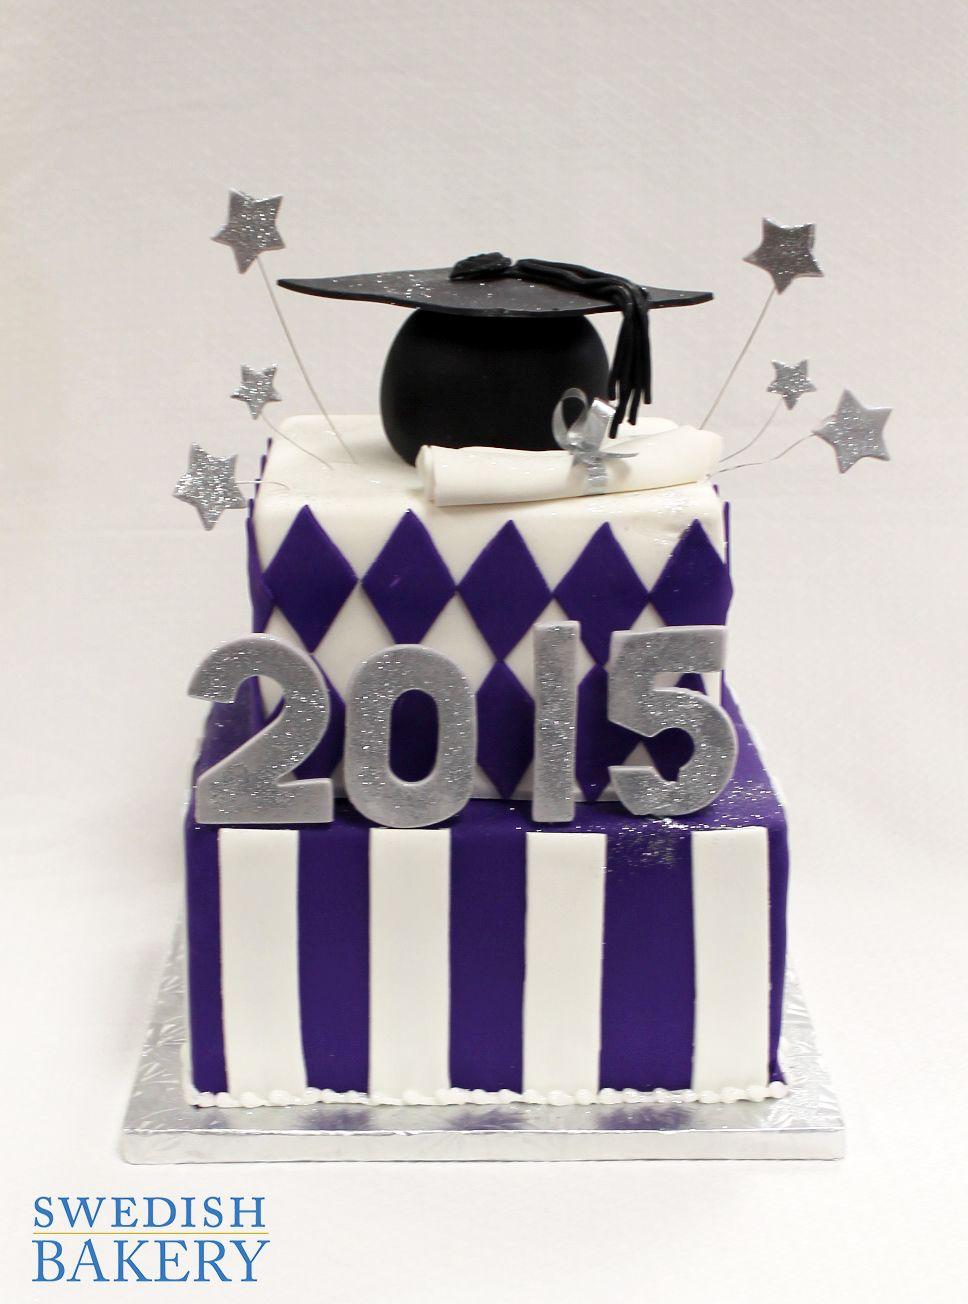 Graduation Cake   Graduation Cap, Year & Stars   Swedish Bakery